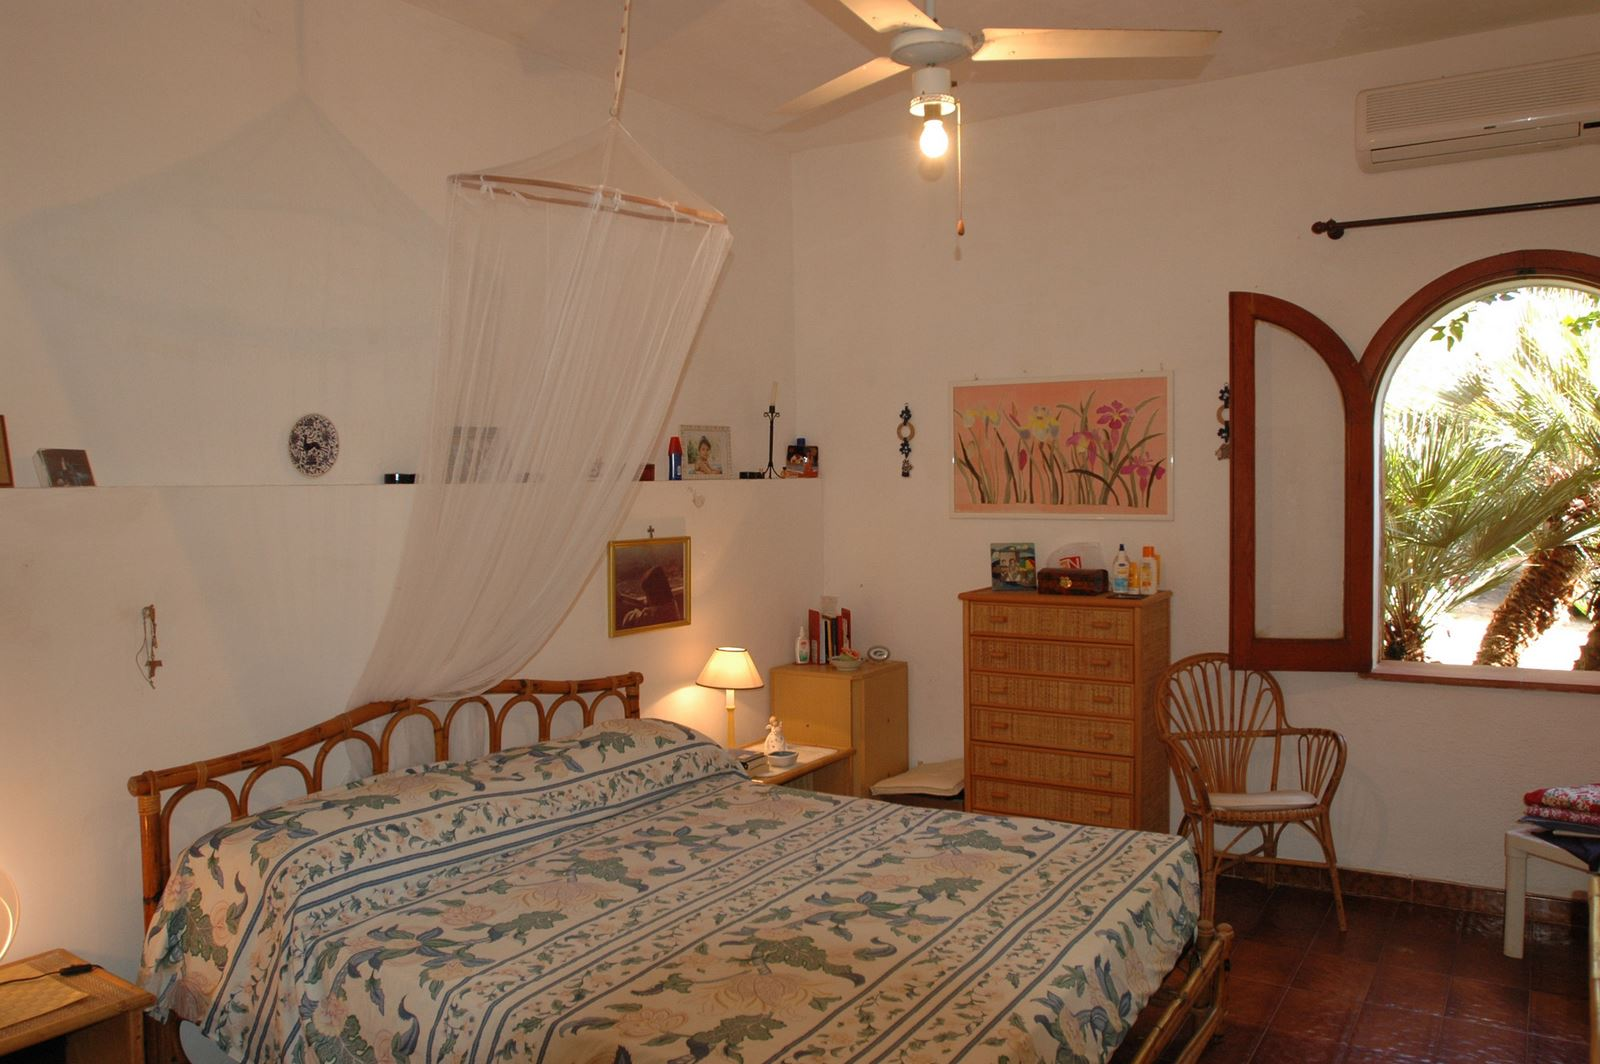 Maison de vacances Casa Fanusa (870904), Siracusa, Siracusa, Sicile, Italie, image 6